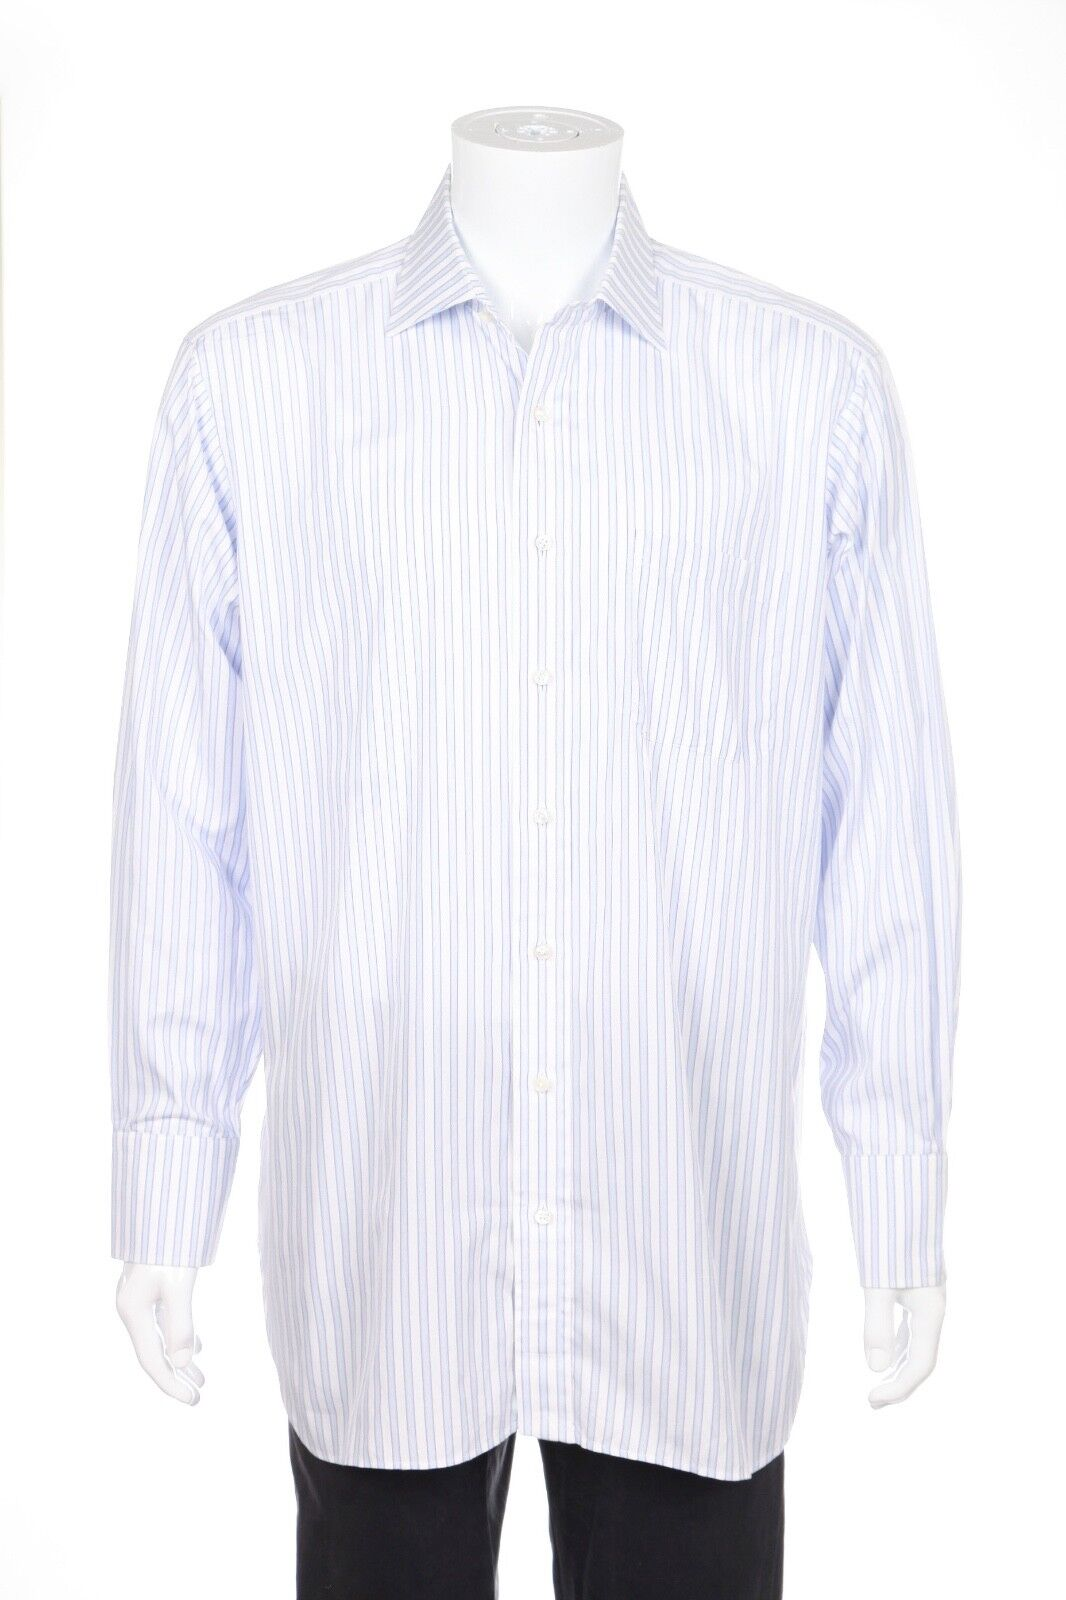 ROBERT TALBOTT Dress Shirt Size 16   41 White bluee Purple Striped Button Down